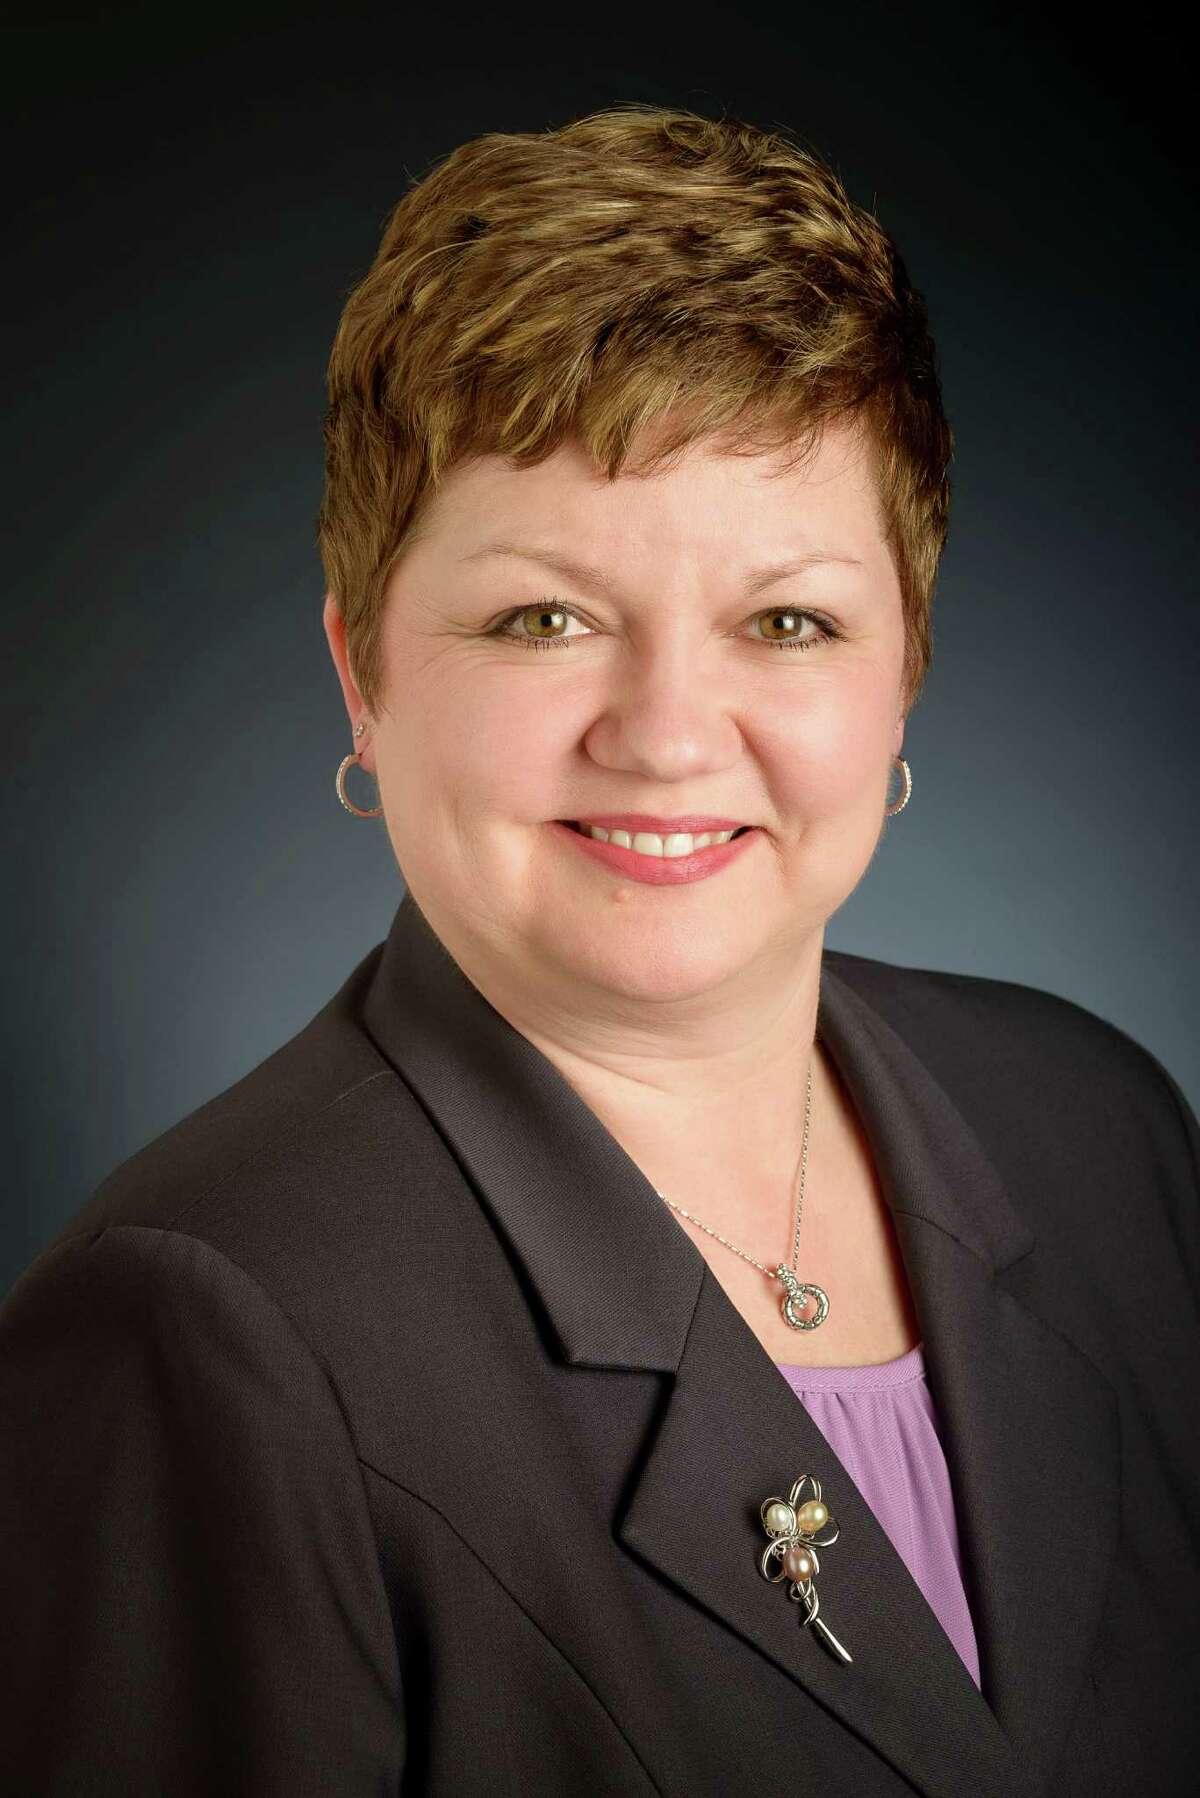 Lori von Heyking has joined Rowan Cos. as vice president, human resources. Lori von Heyking